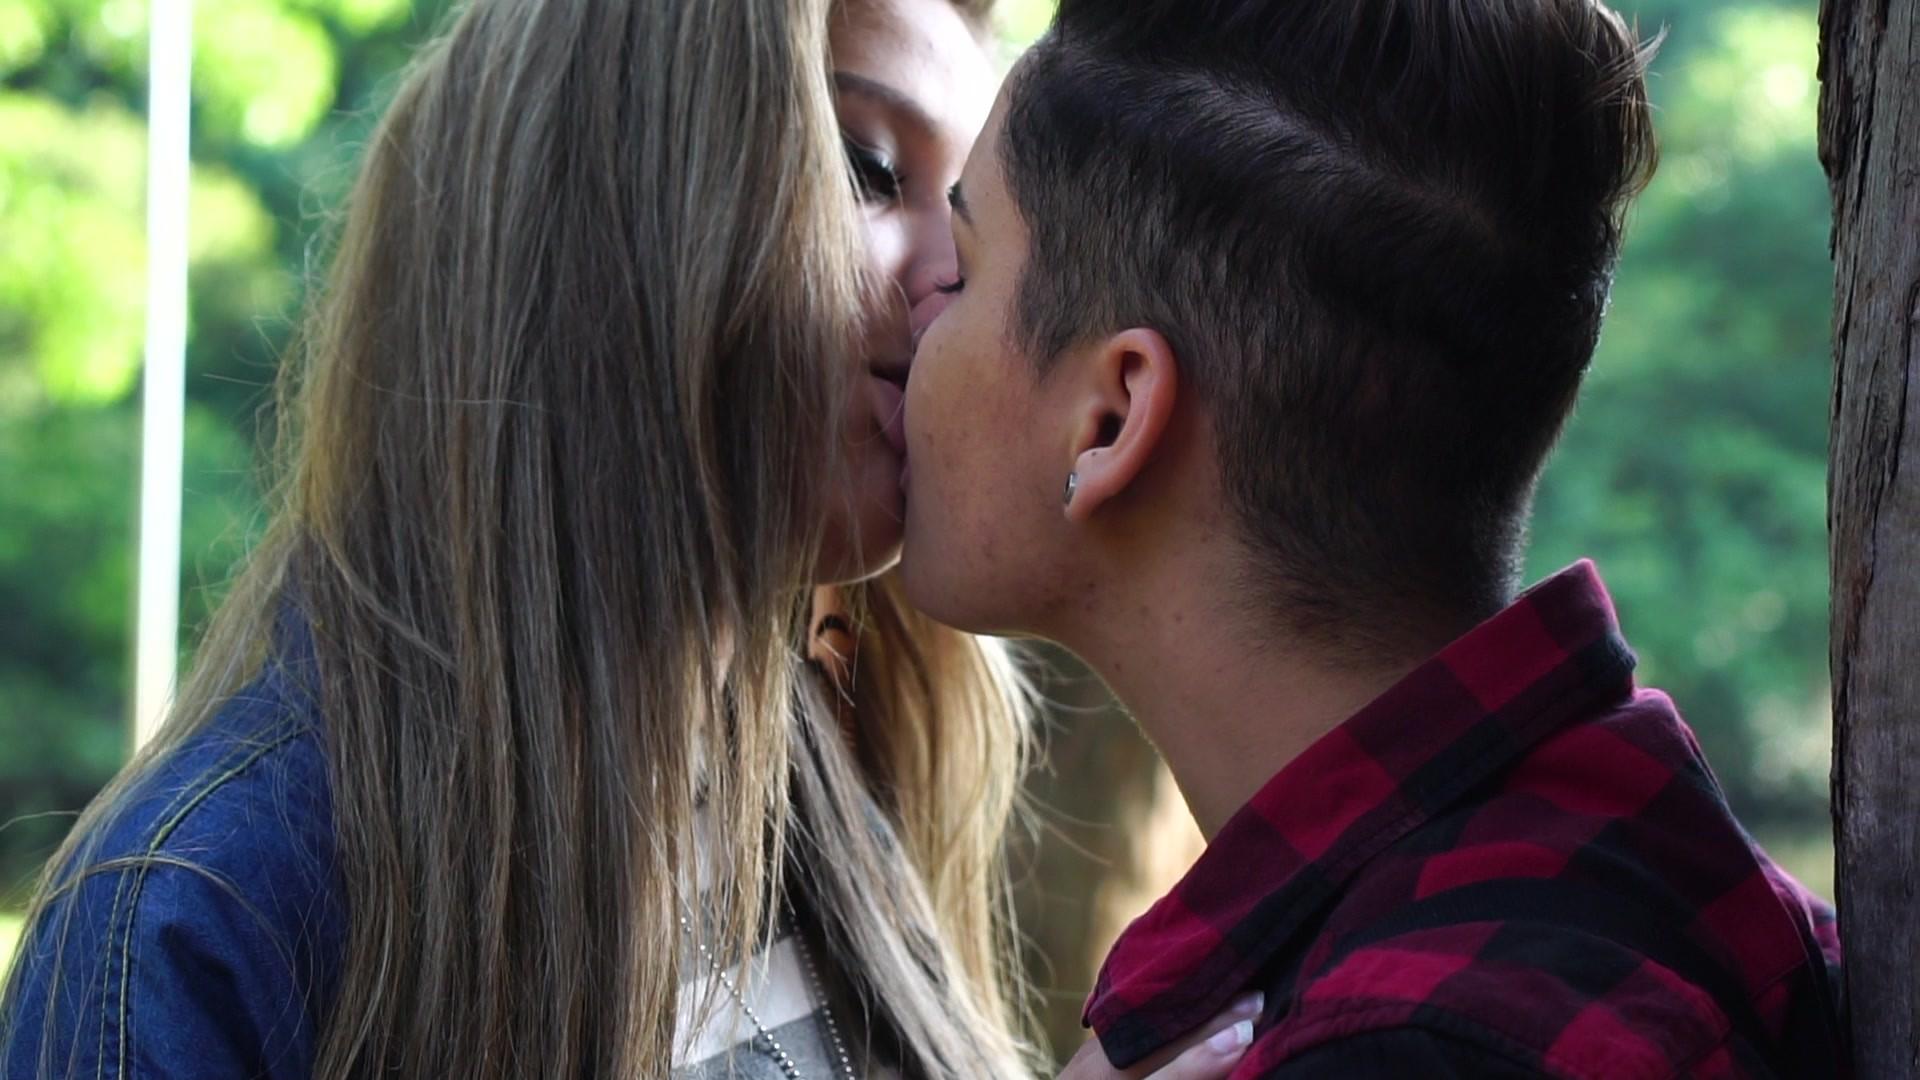 Res: 1920x1080, lesbian kiss wallpaper #892310